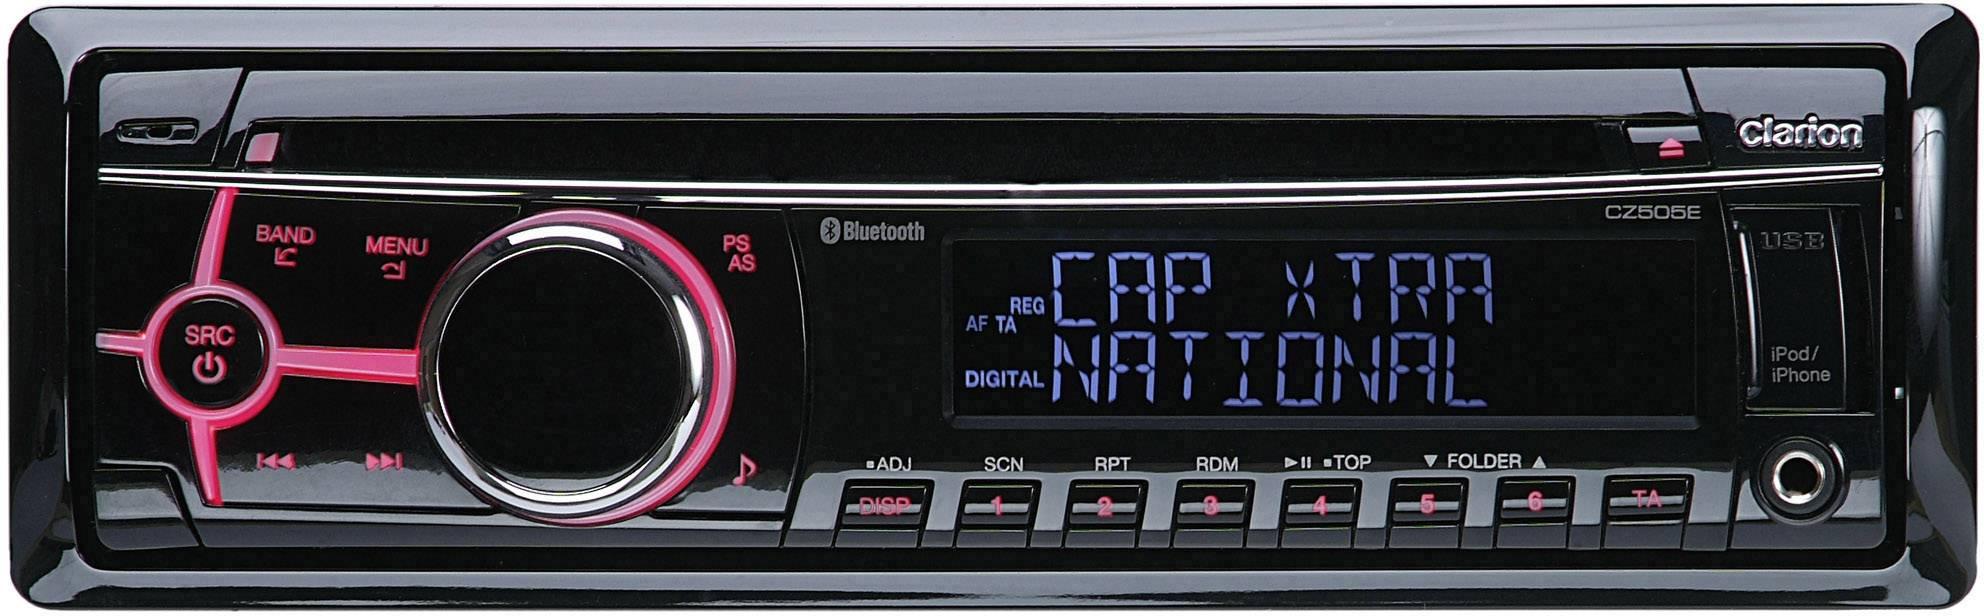 Clarion CZ505E Car stereo DAB+ tuner, Bluetooth handsfree